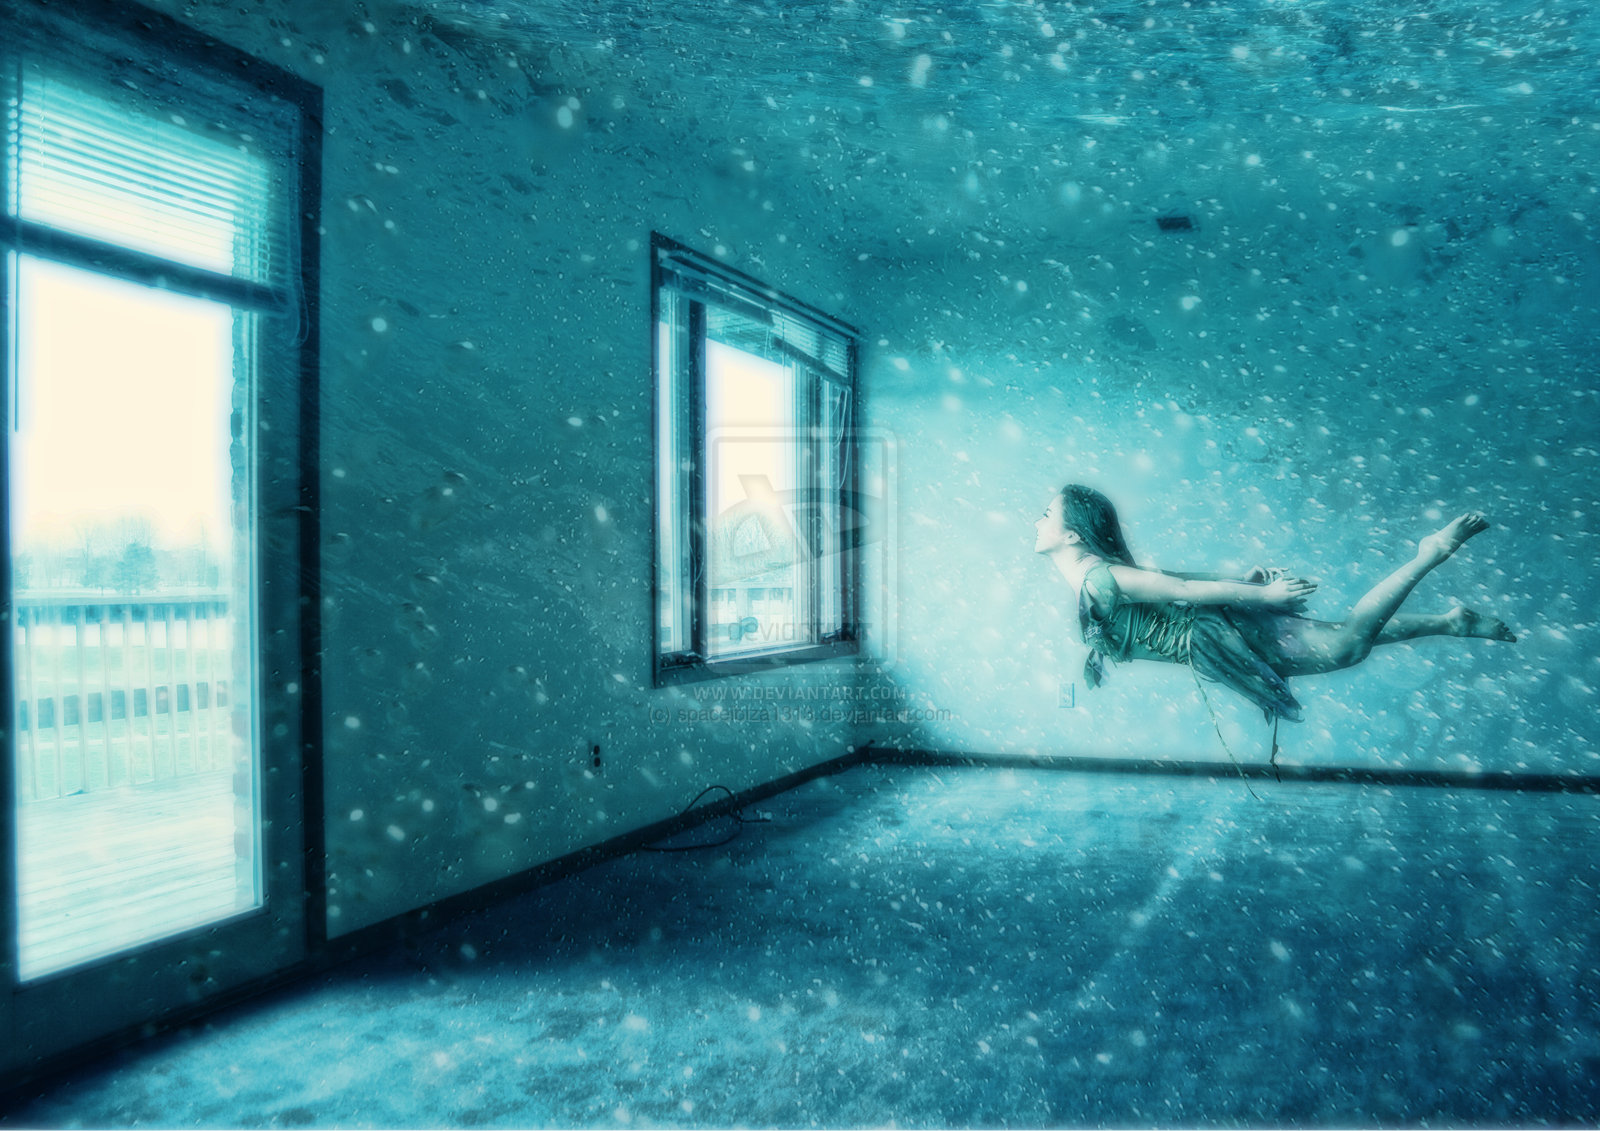 wallpaper water girl 04 by spaceibiza1313 1600x1131